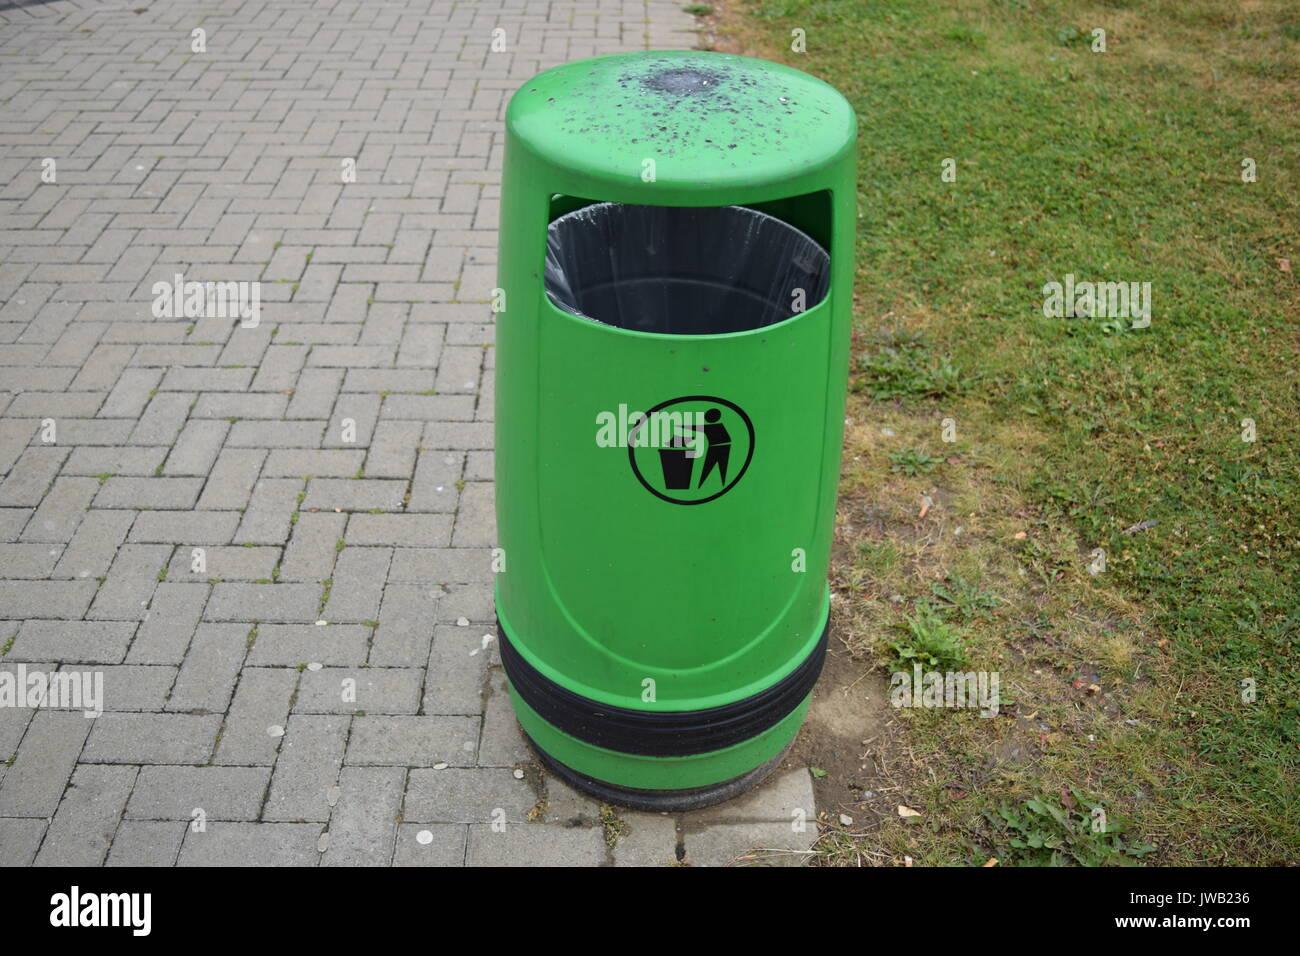 Green bin in the street - Stock Image